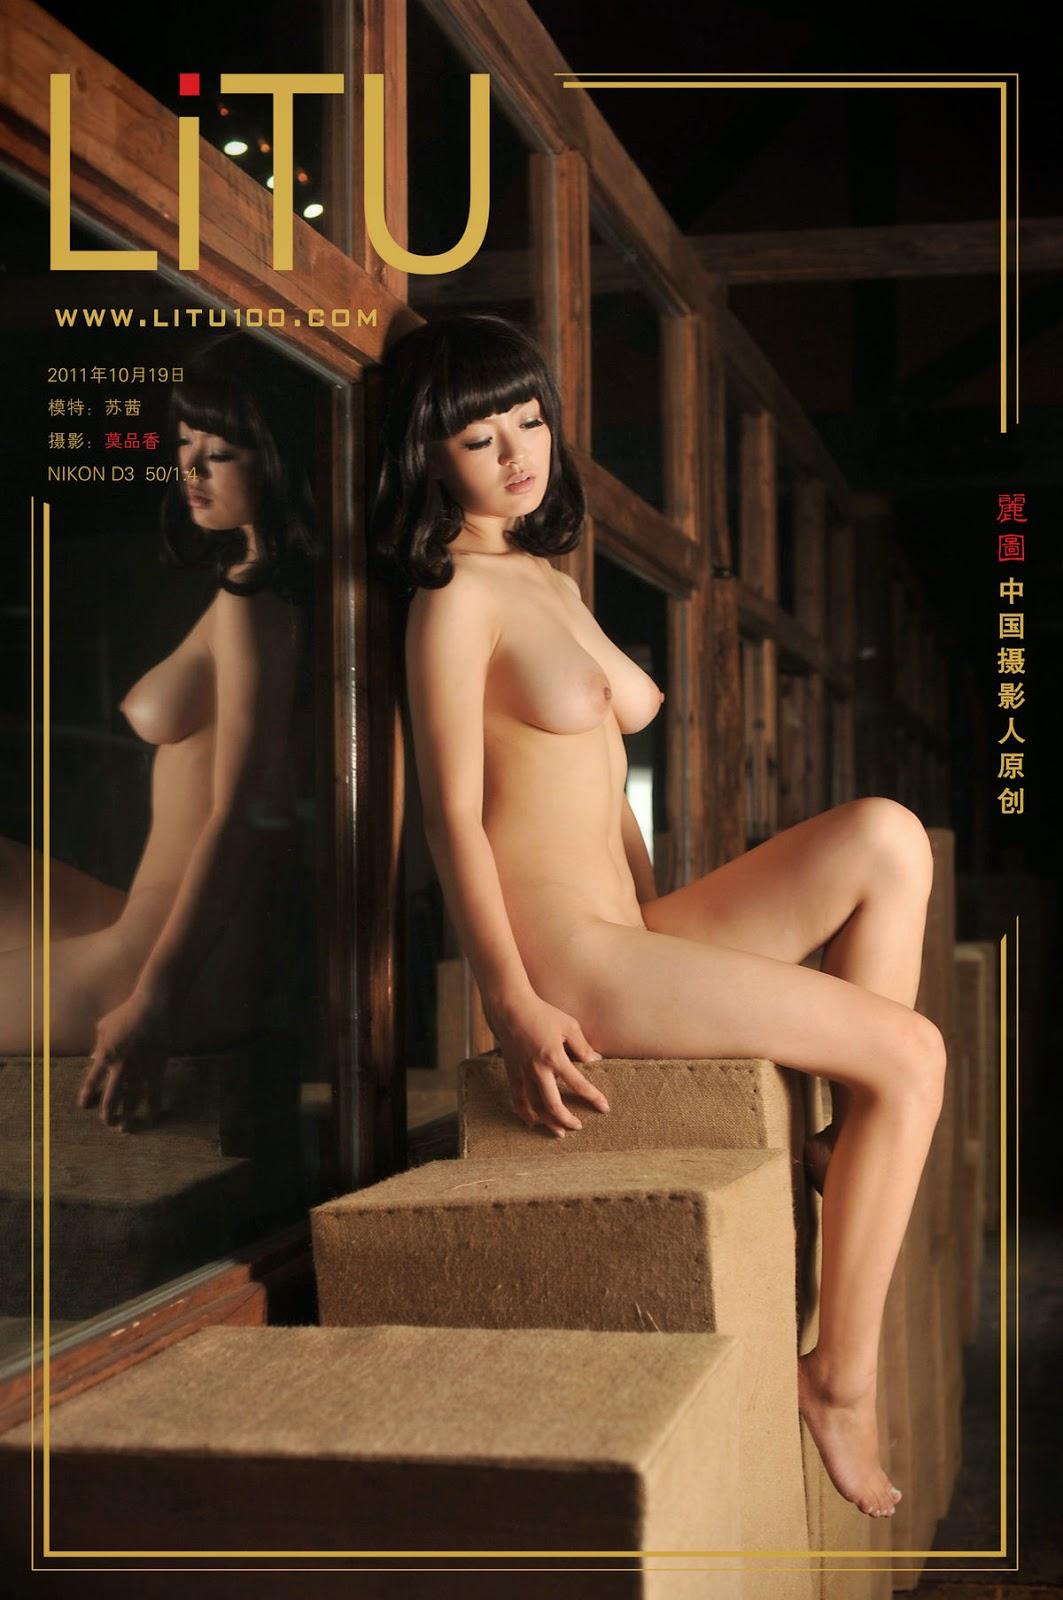 Chinese Nude Model Su Quan [Litu100] | 18+ gallery photos